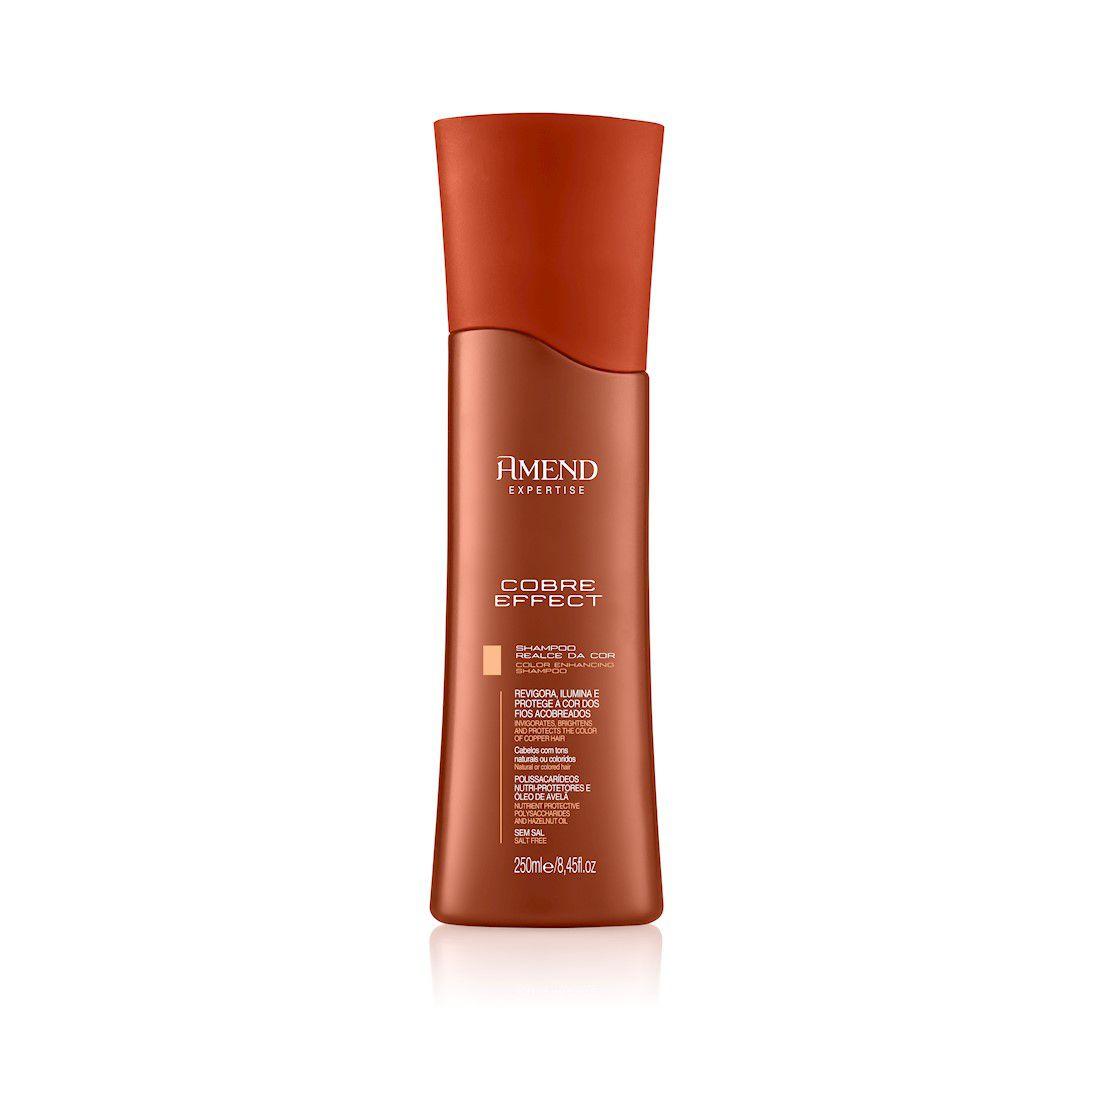 Amend Shampoo Treatment Expertise Cobre Effect 250mL